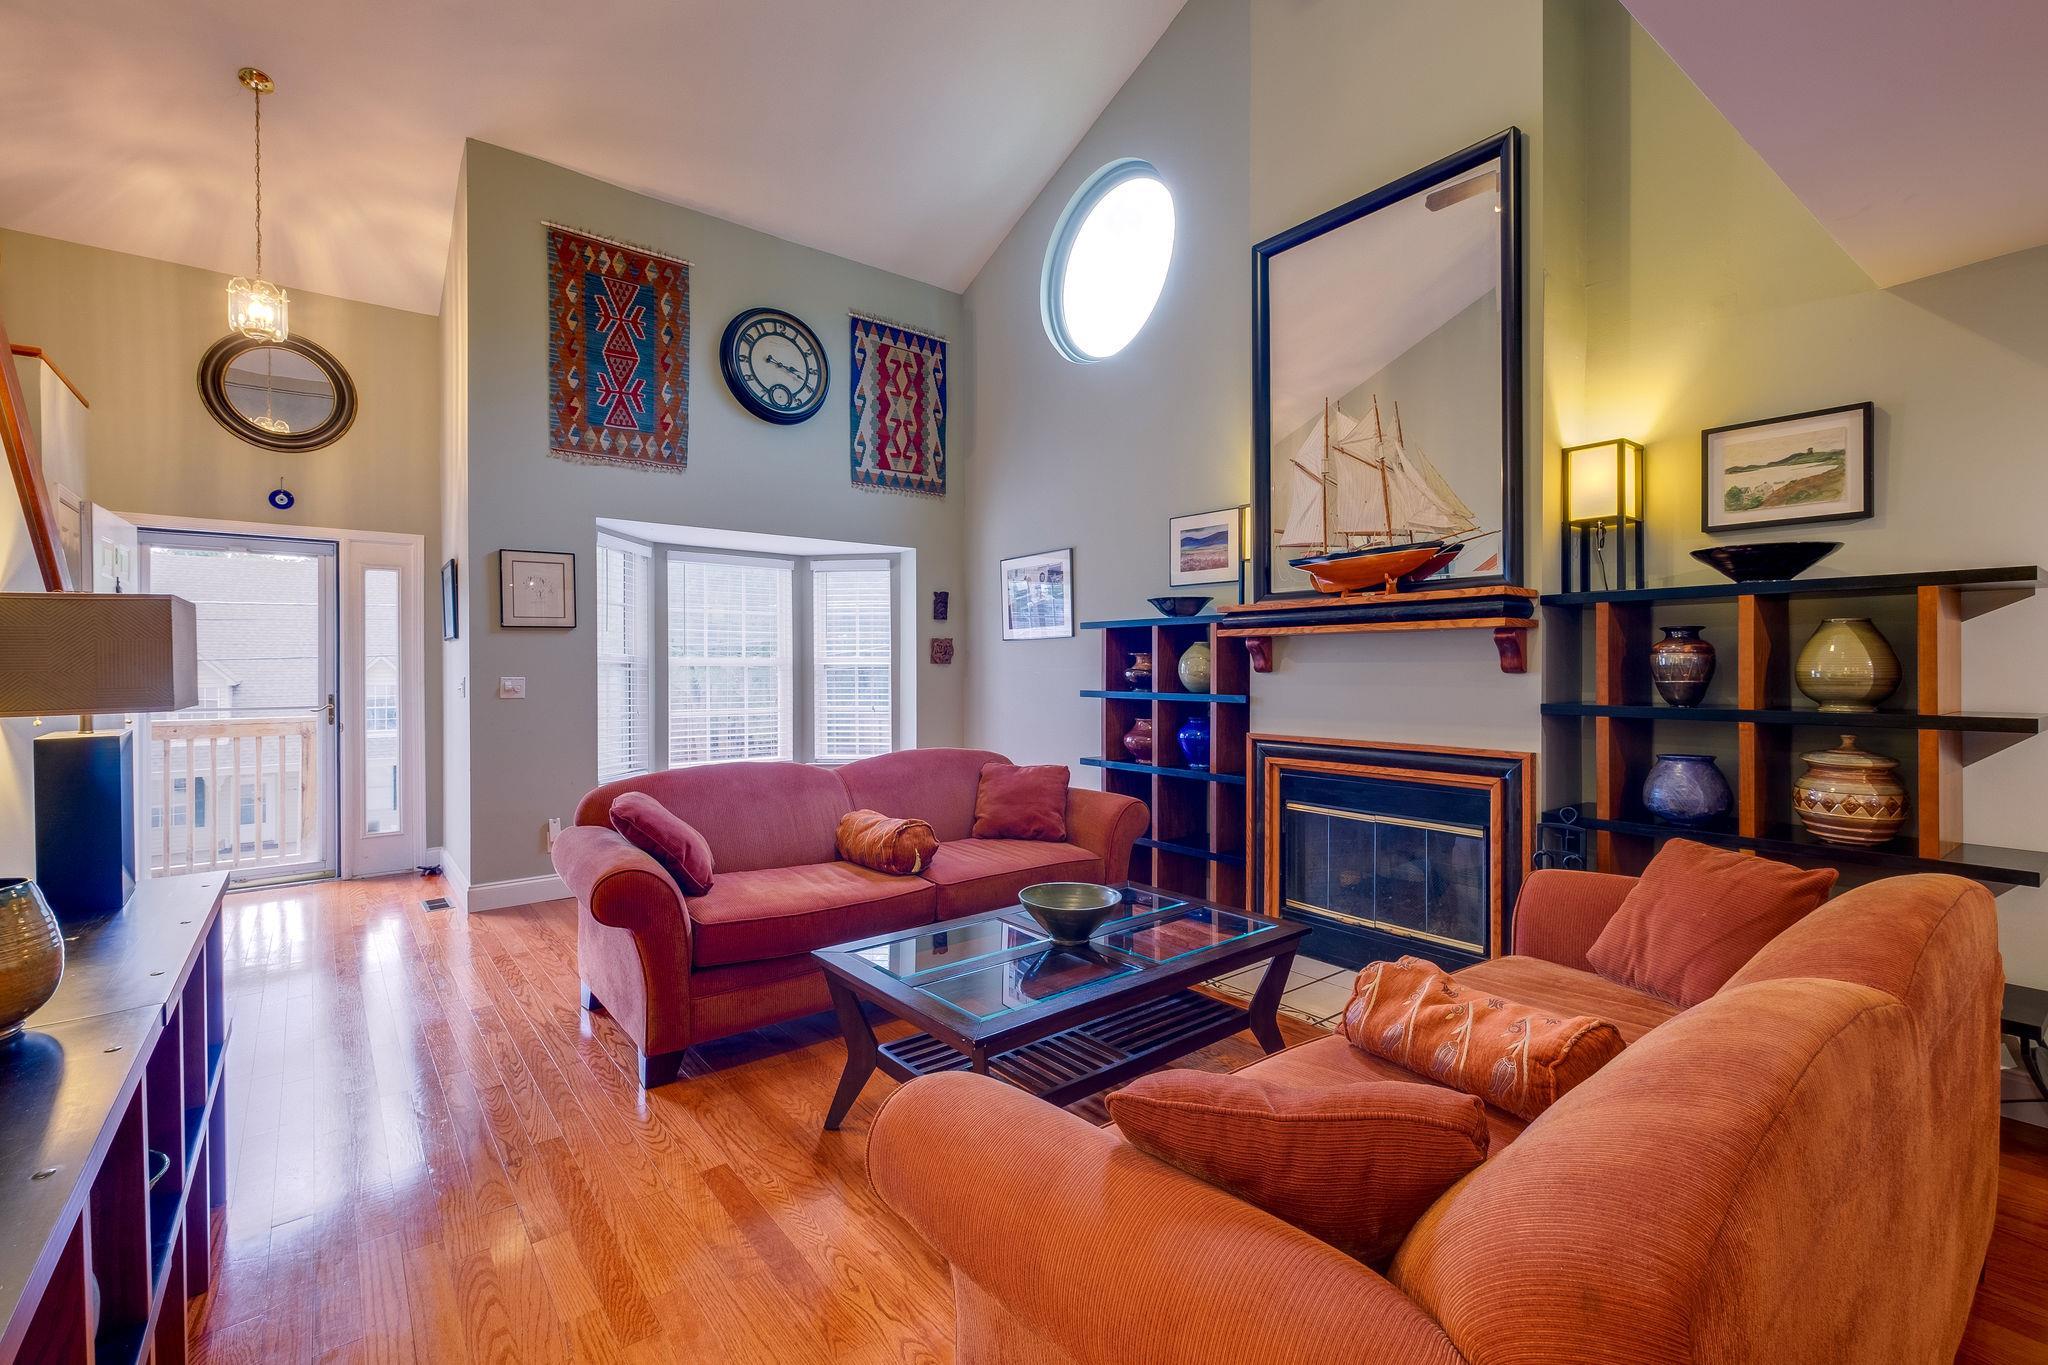 1612B Boscobel St, Nashville, TN 37206 - Nashville, TN real estate listing